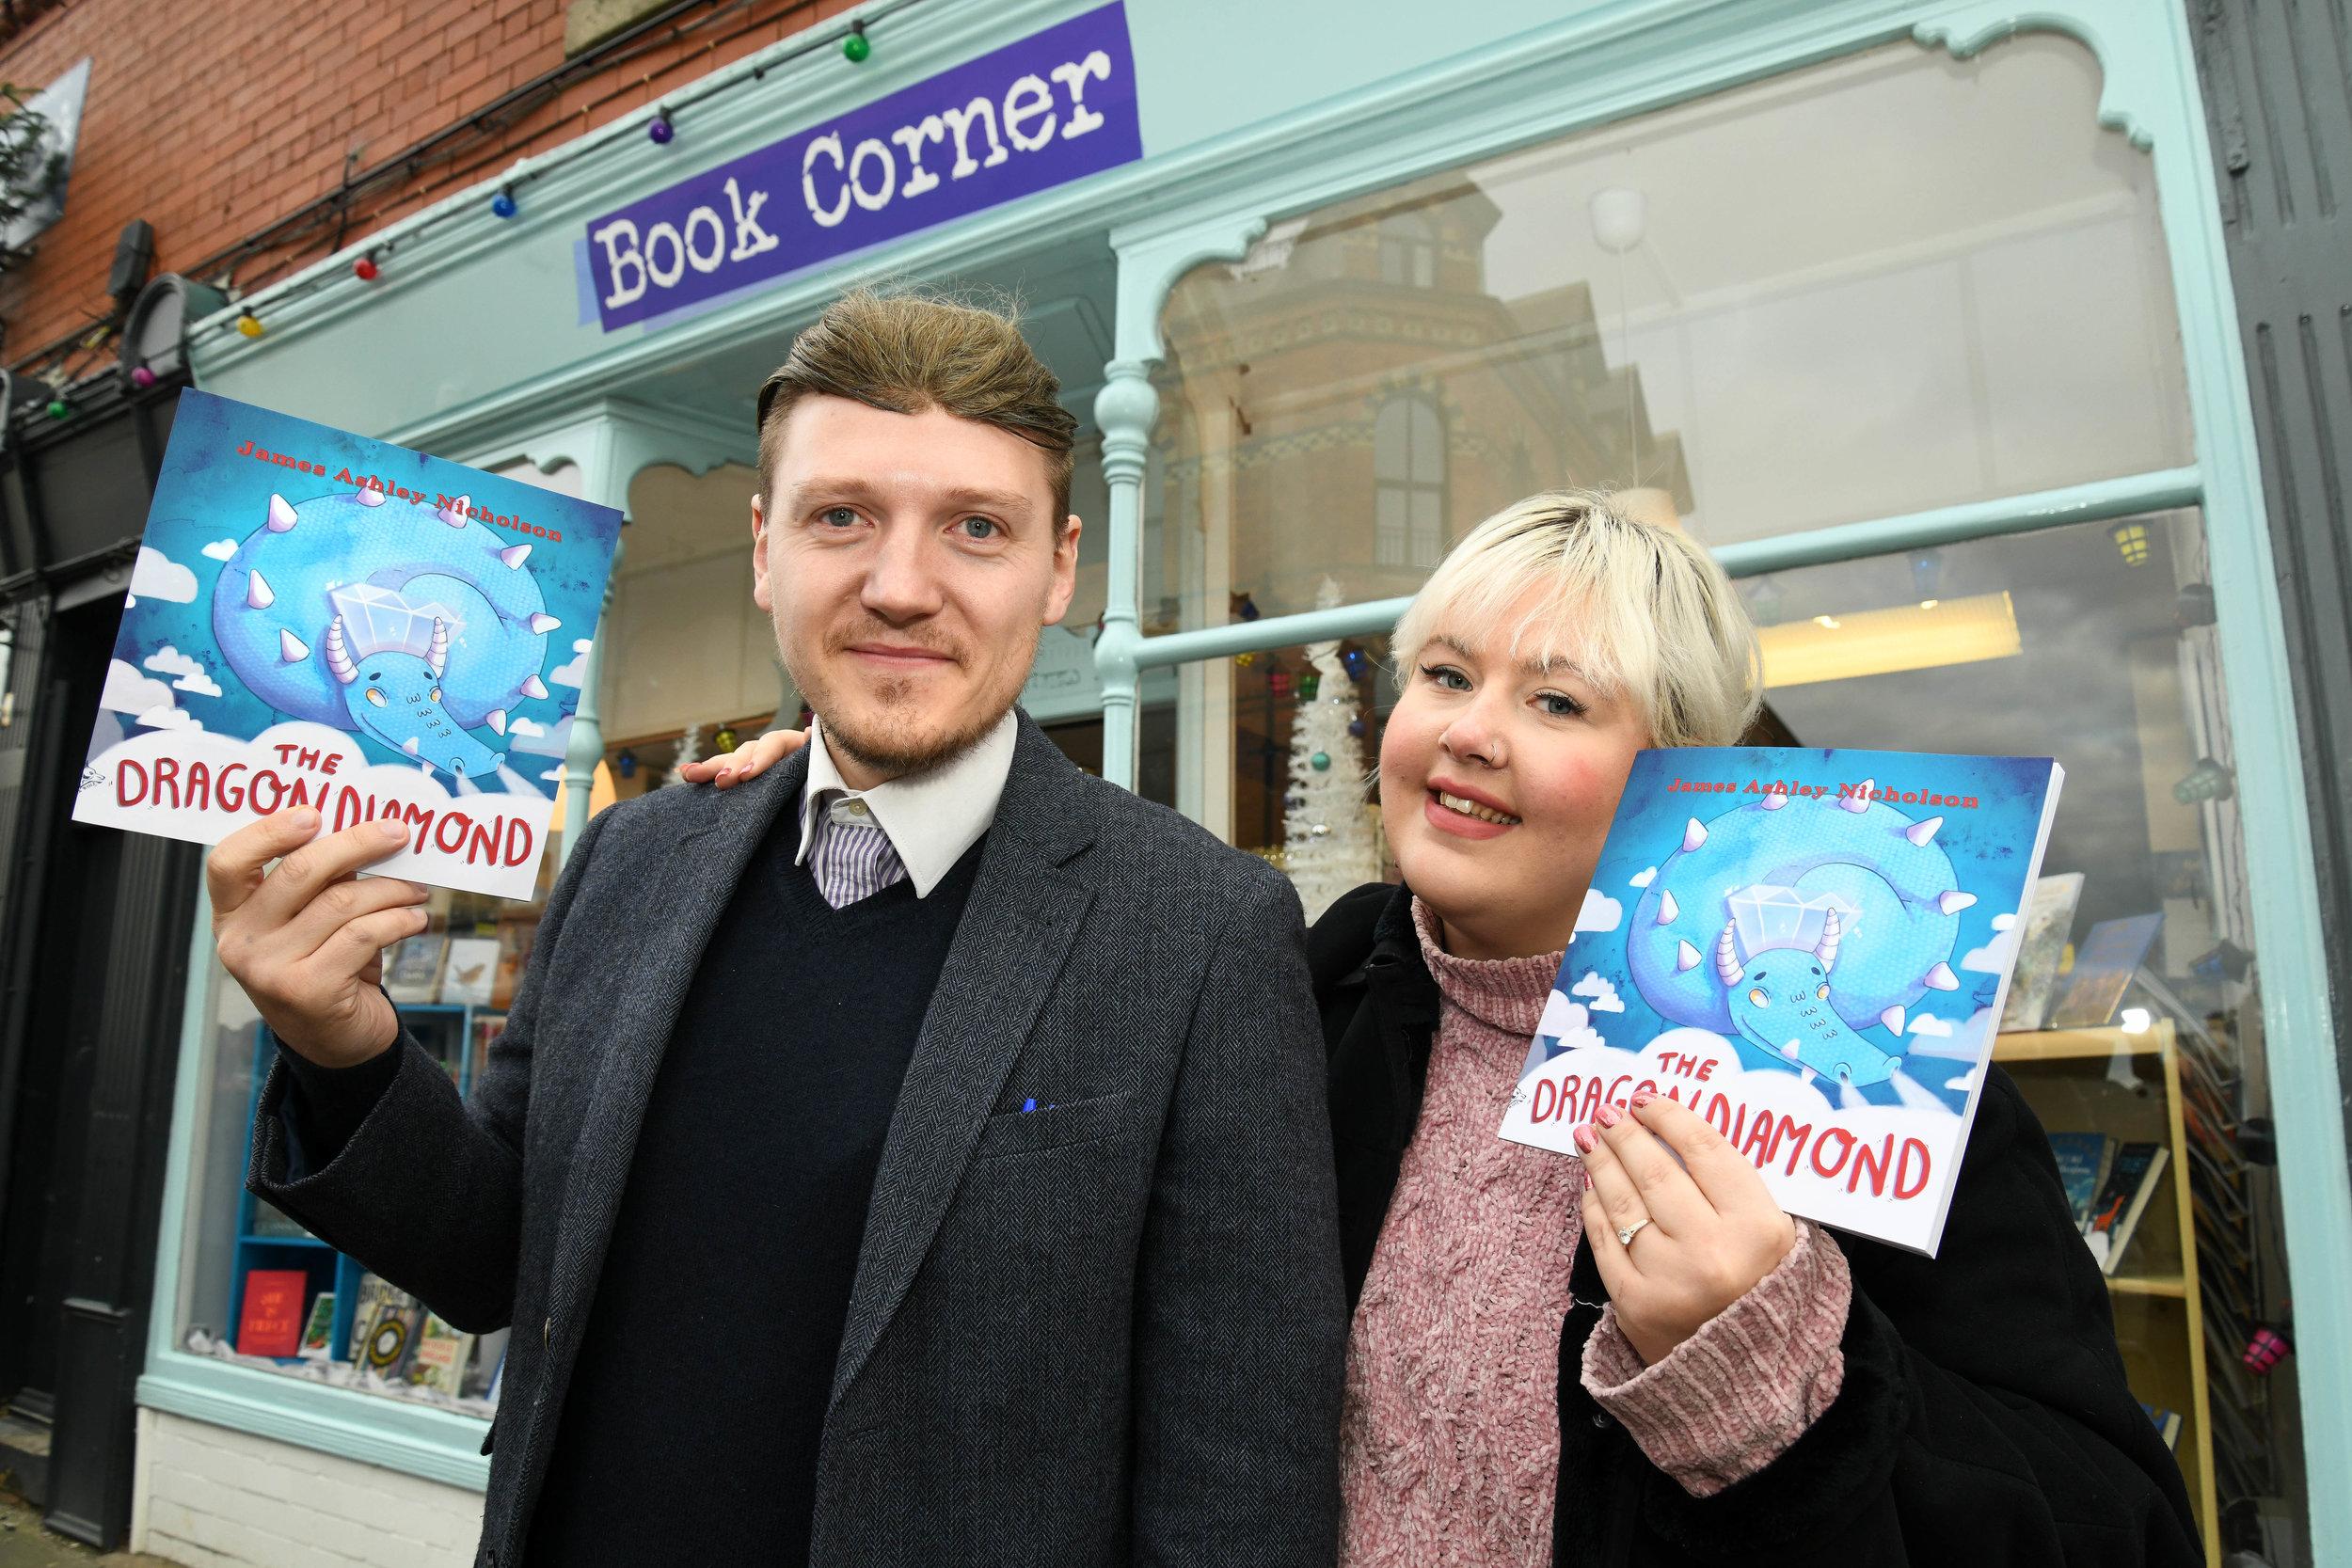 James Nicholson, author of The Dragon Diamond, with illustrator Catherine Kay.